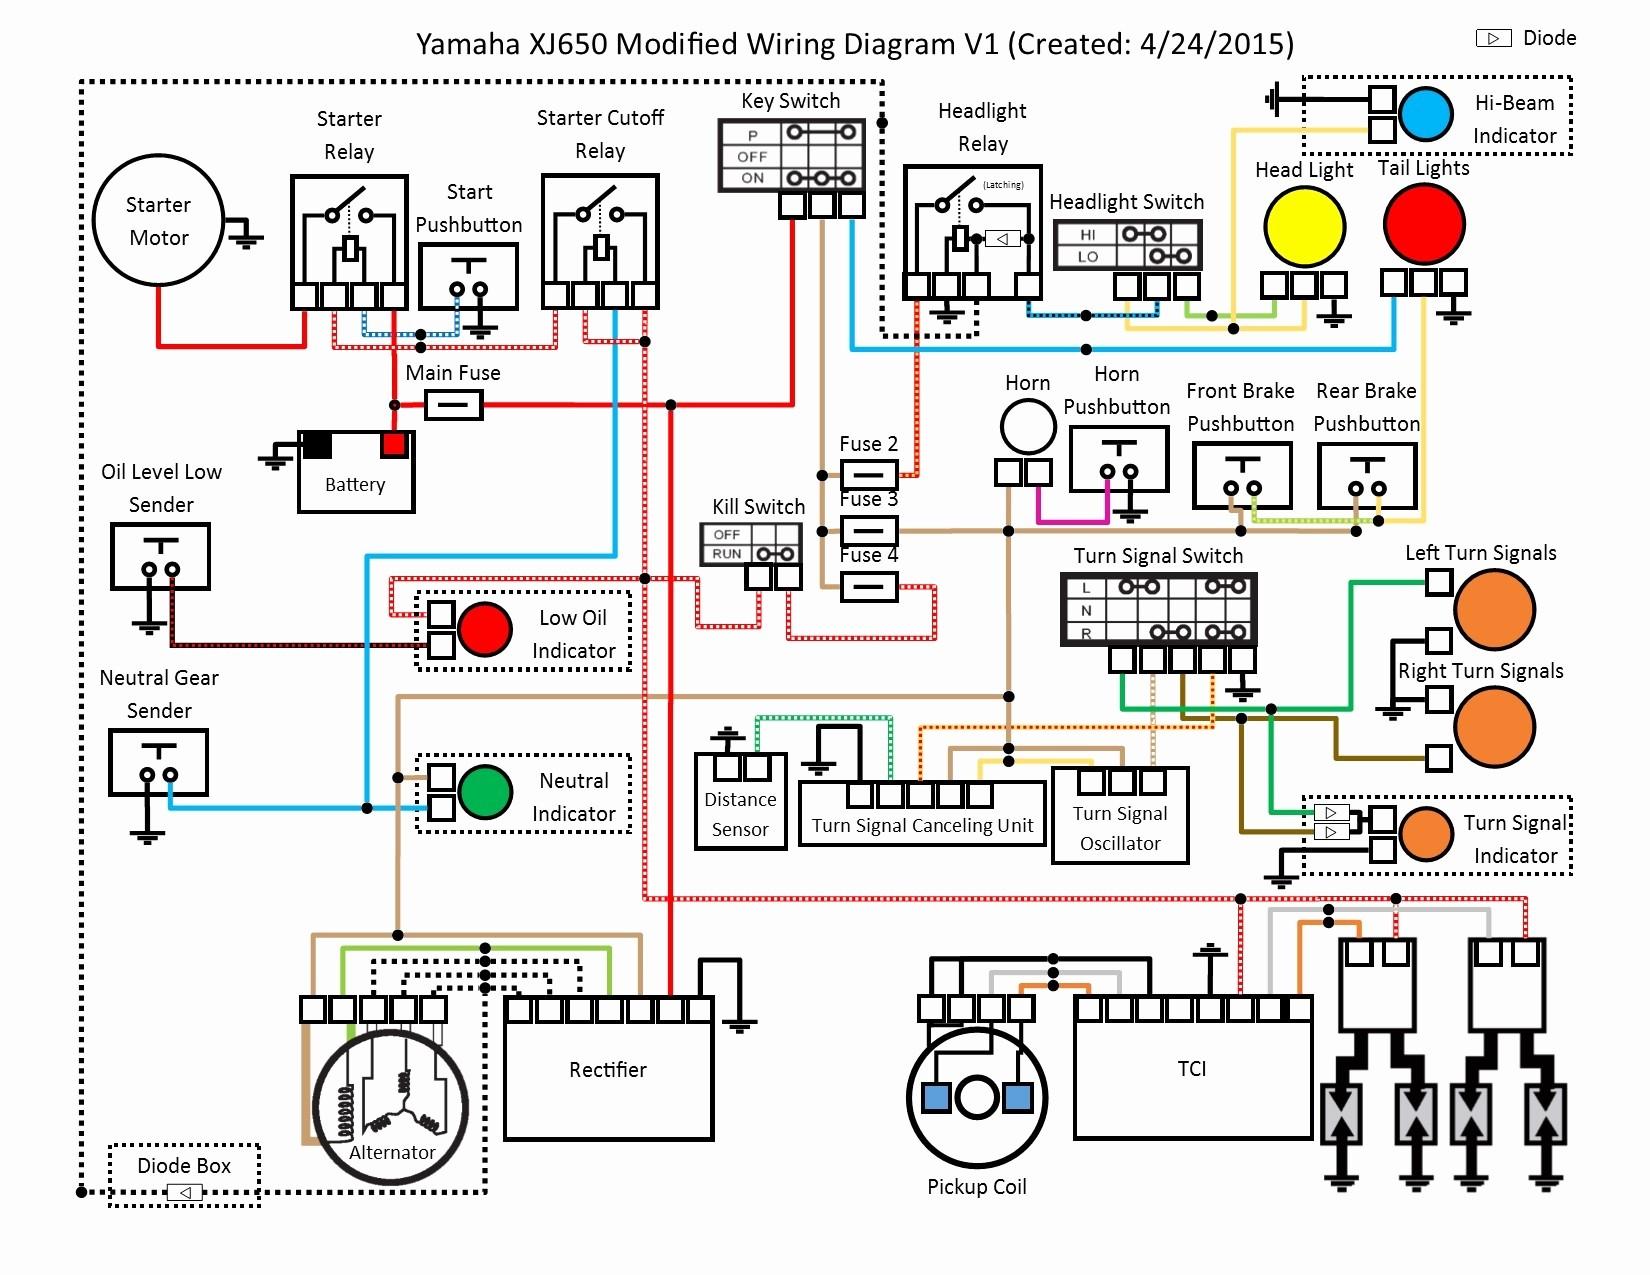 Diagram Cb550 Wiring Diagram Full Hd Version Wiring Diagram Maas Diagram Tacchettidiferro It